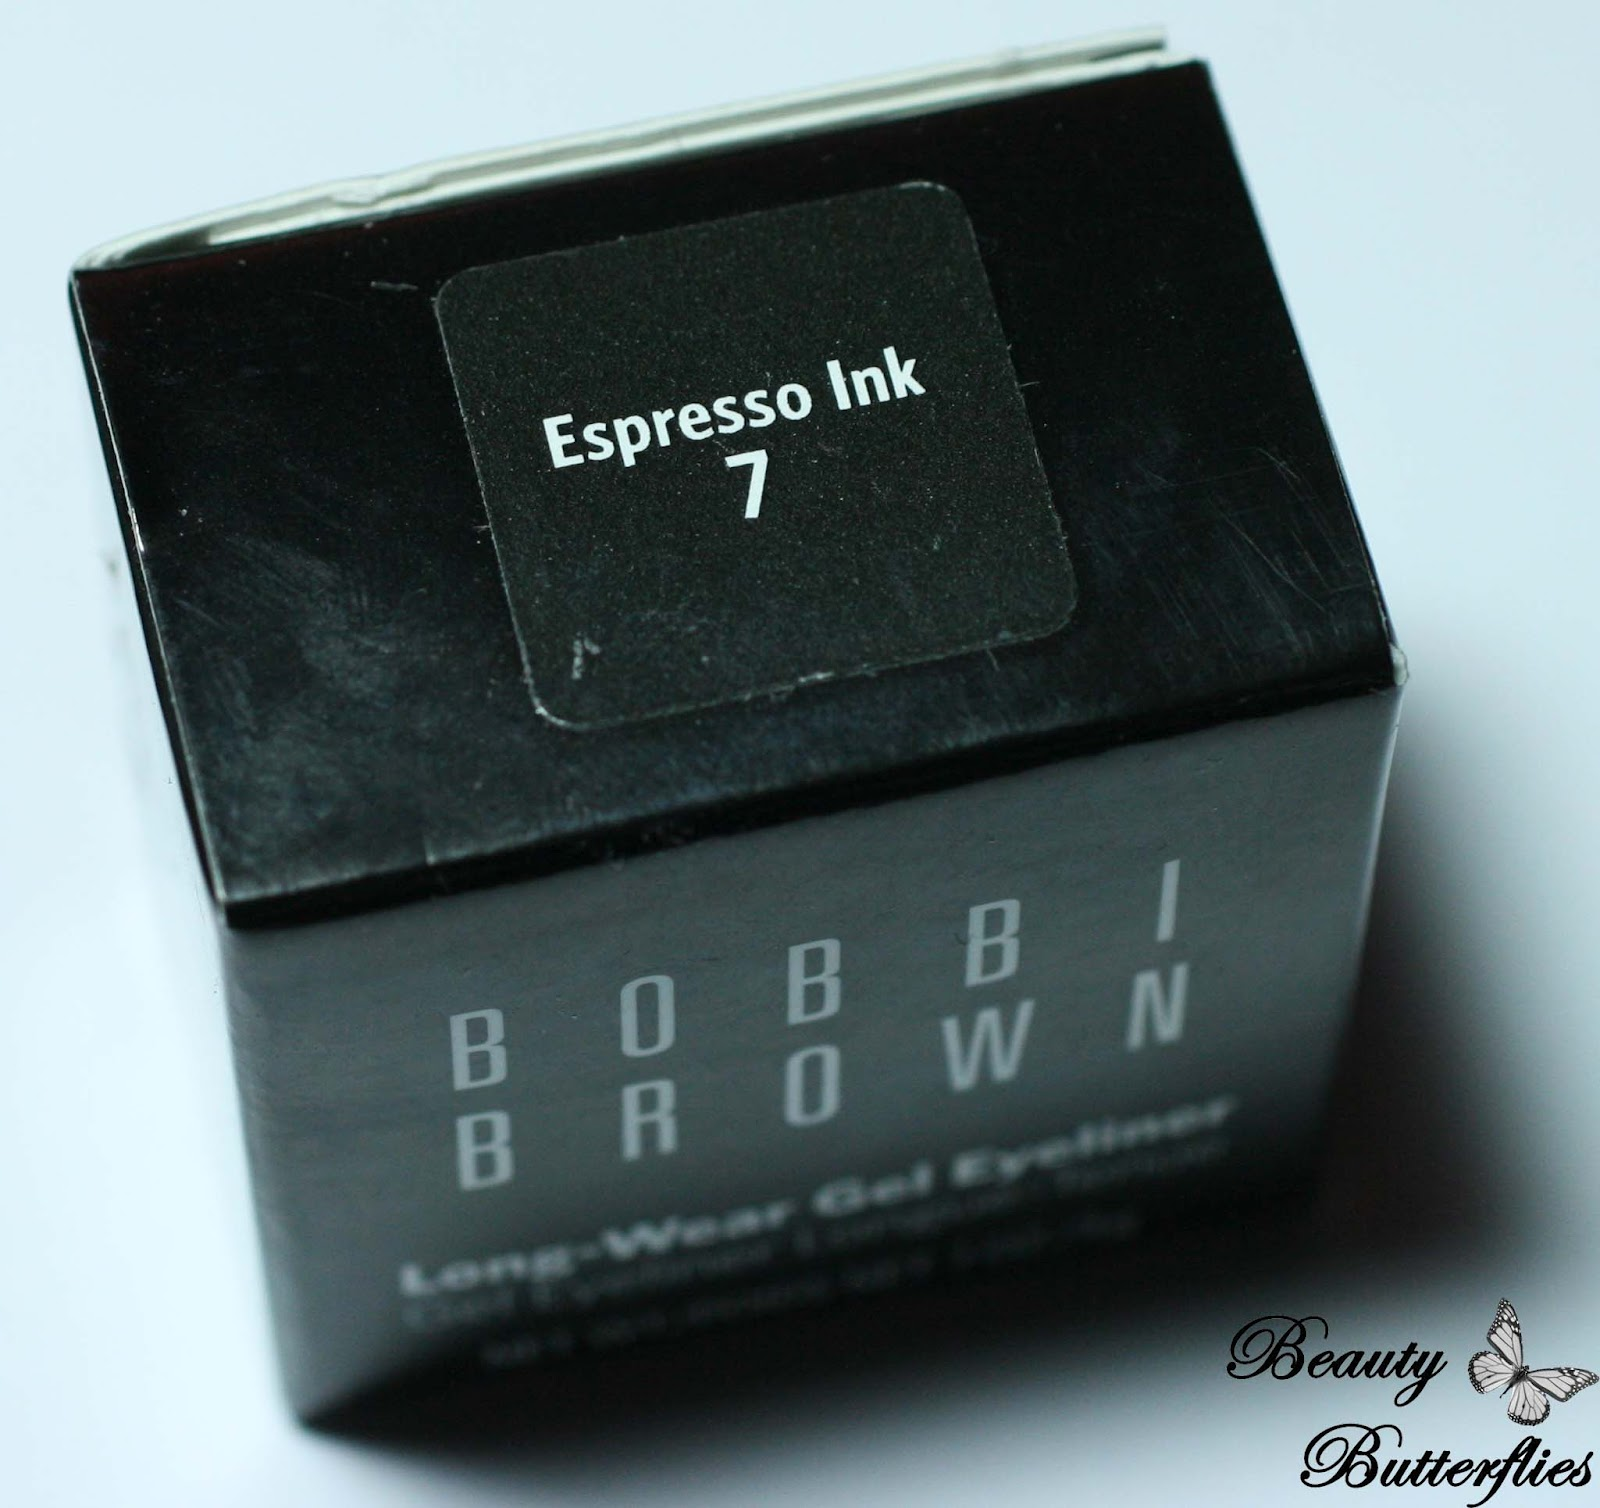 Review Bobbi Brown Long Wear Gel Eyeliner Espresso Ink